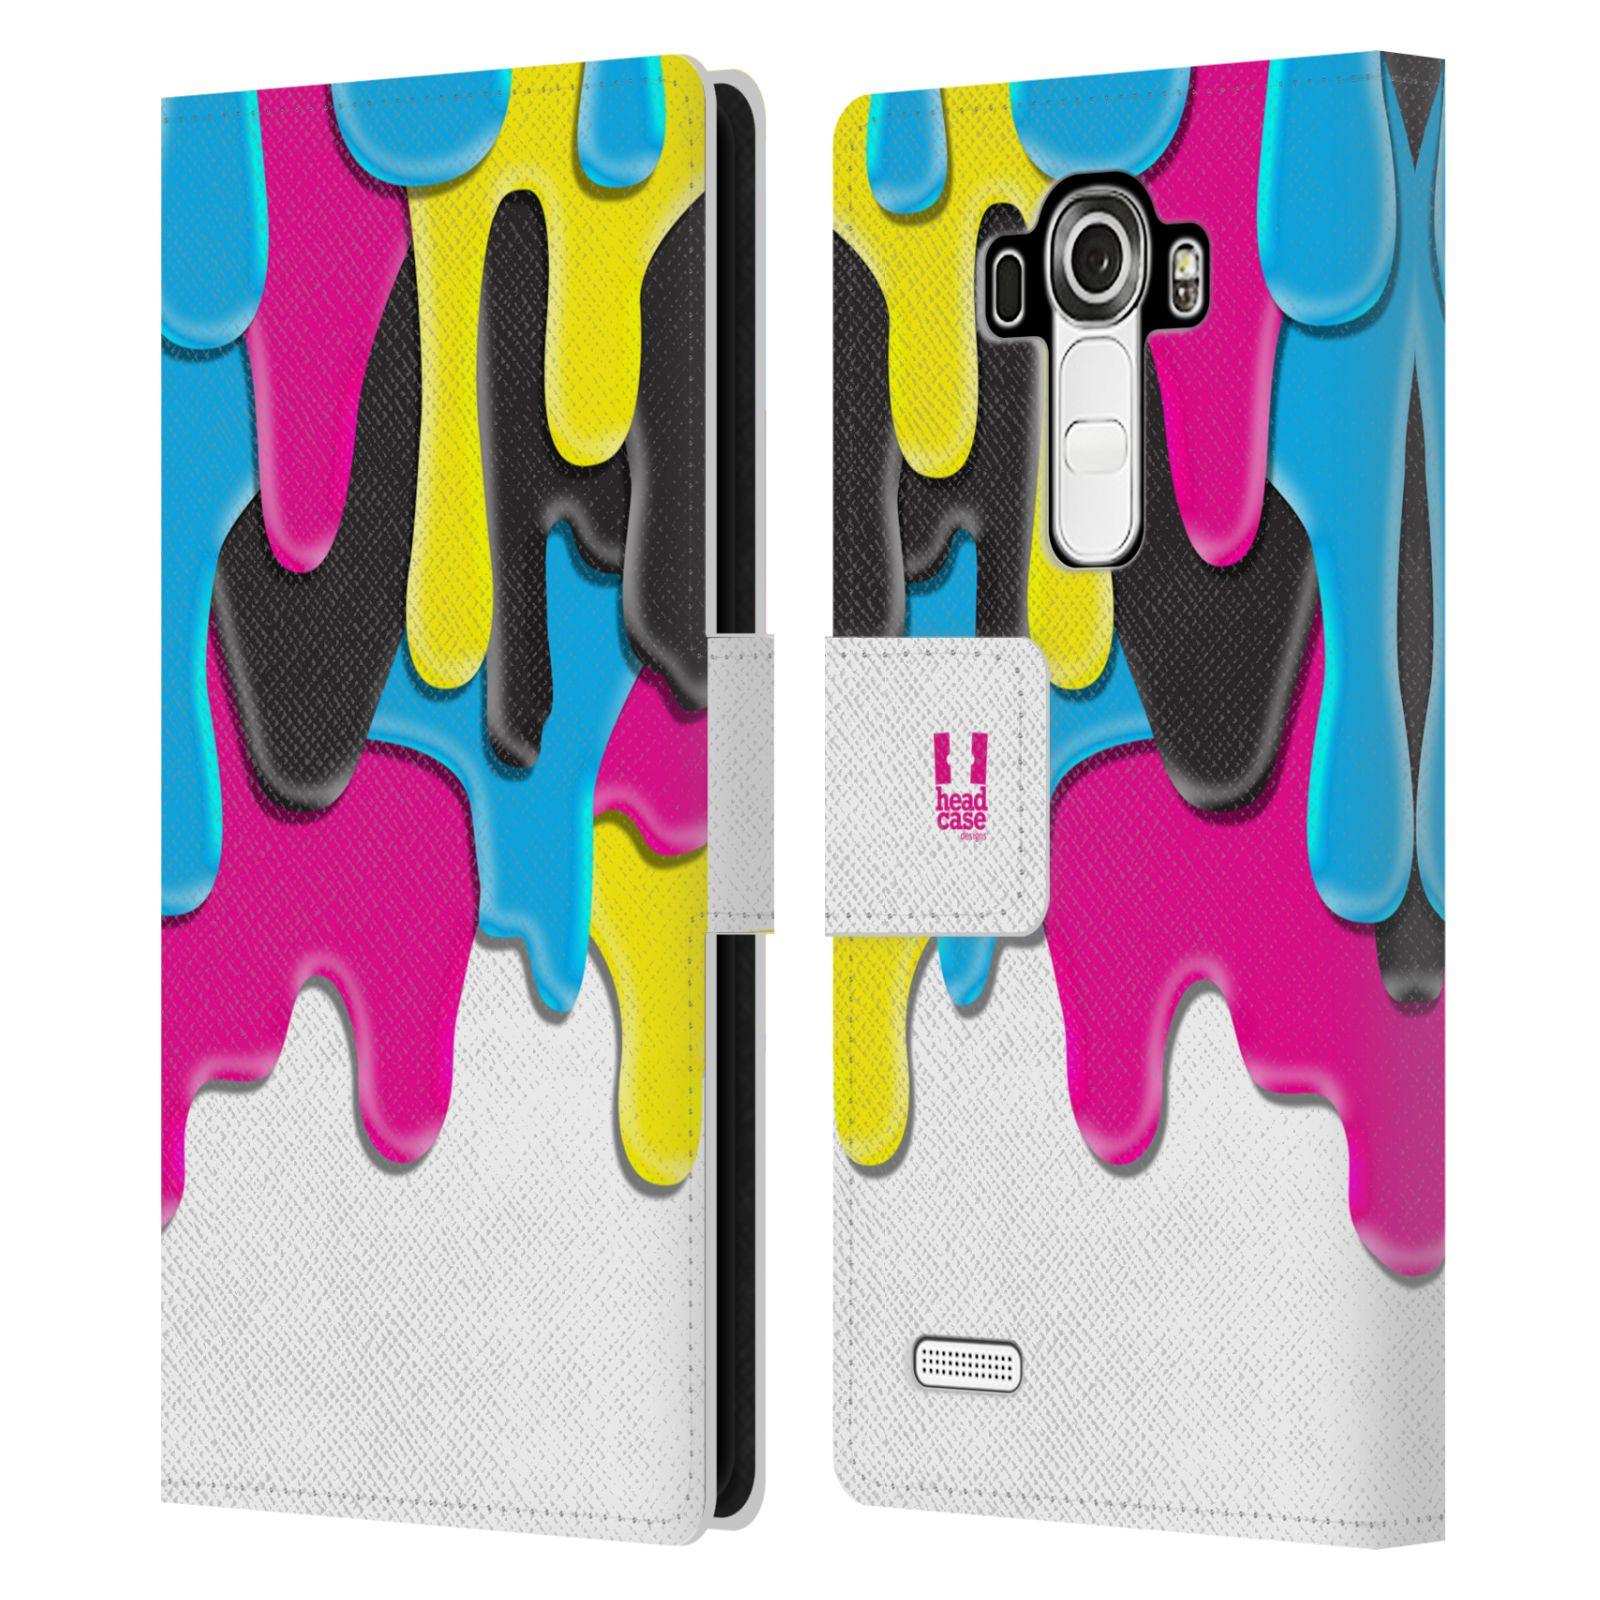 HEAD CASE Flipové pouzdro pro mobil LG G4 (H815) ZÁPLAVA BARVA MIX barev